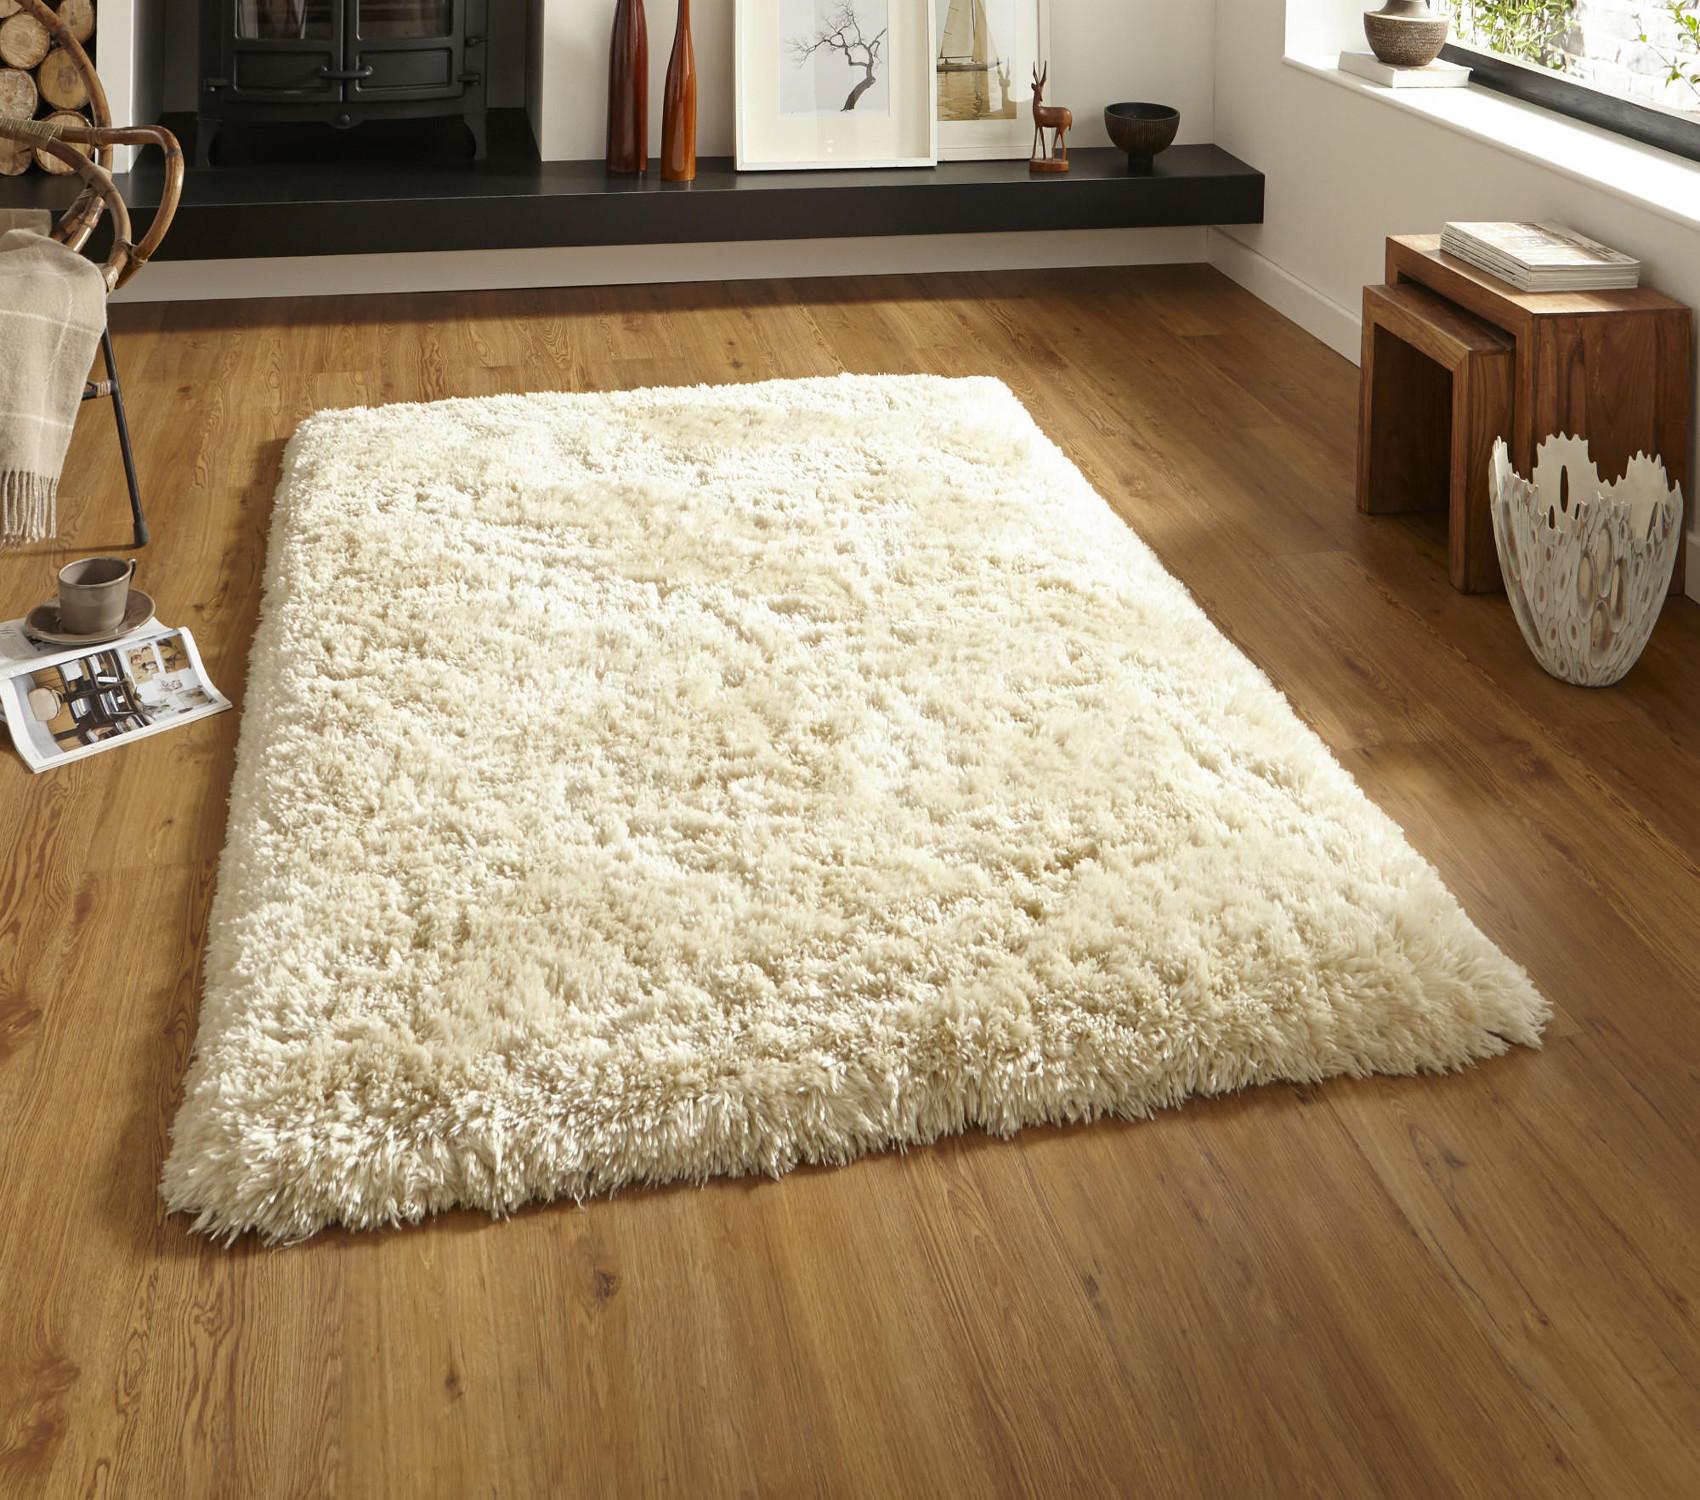 Super soft hand tufted shaggy rug polar pile 100 for Home decorators sumba rug